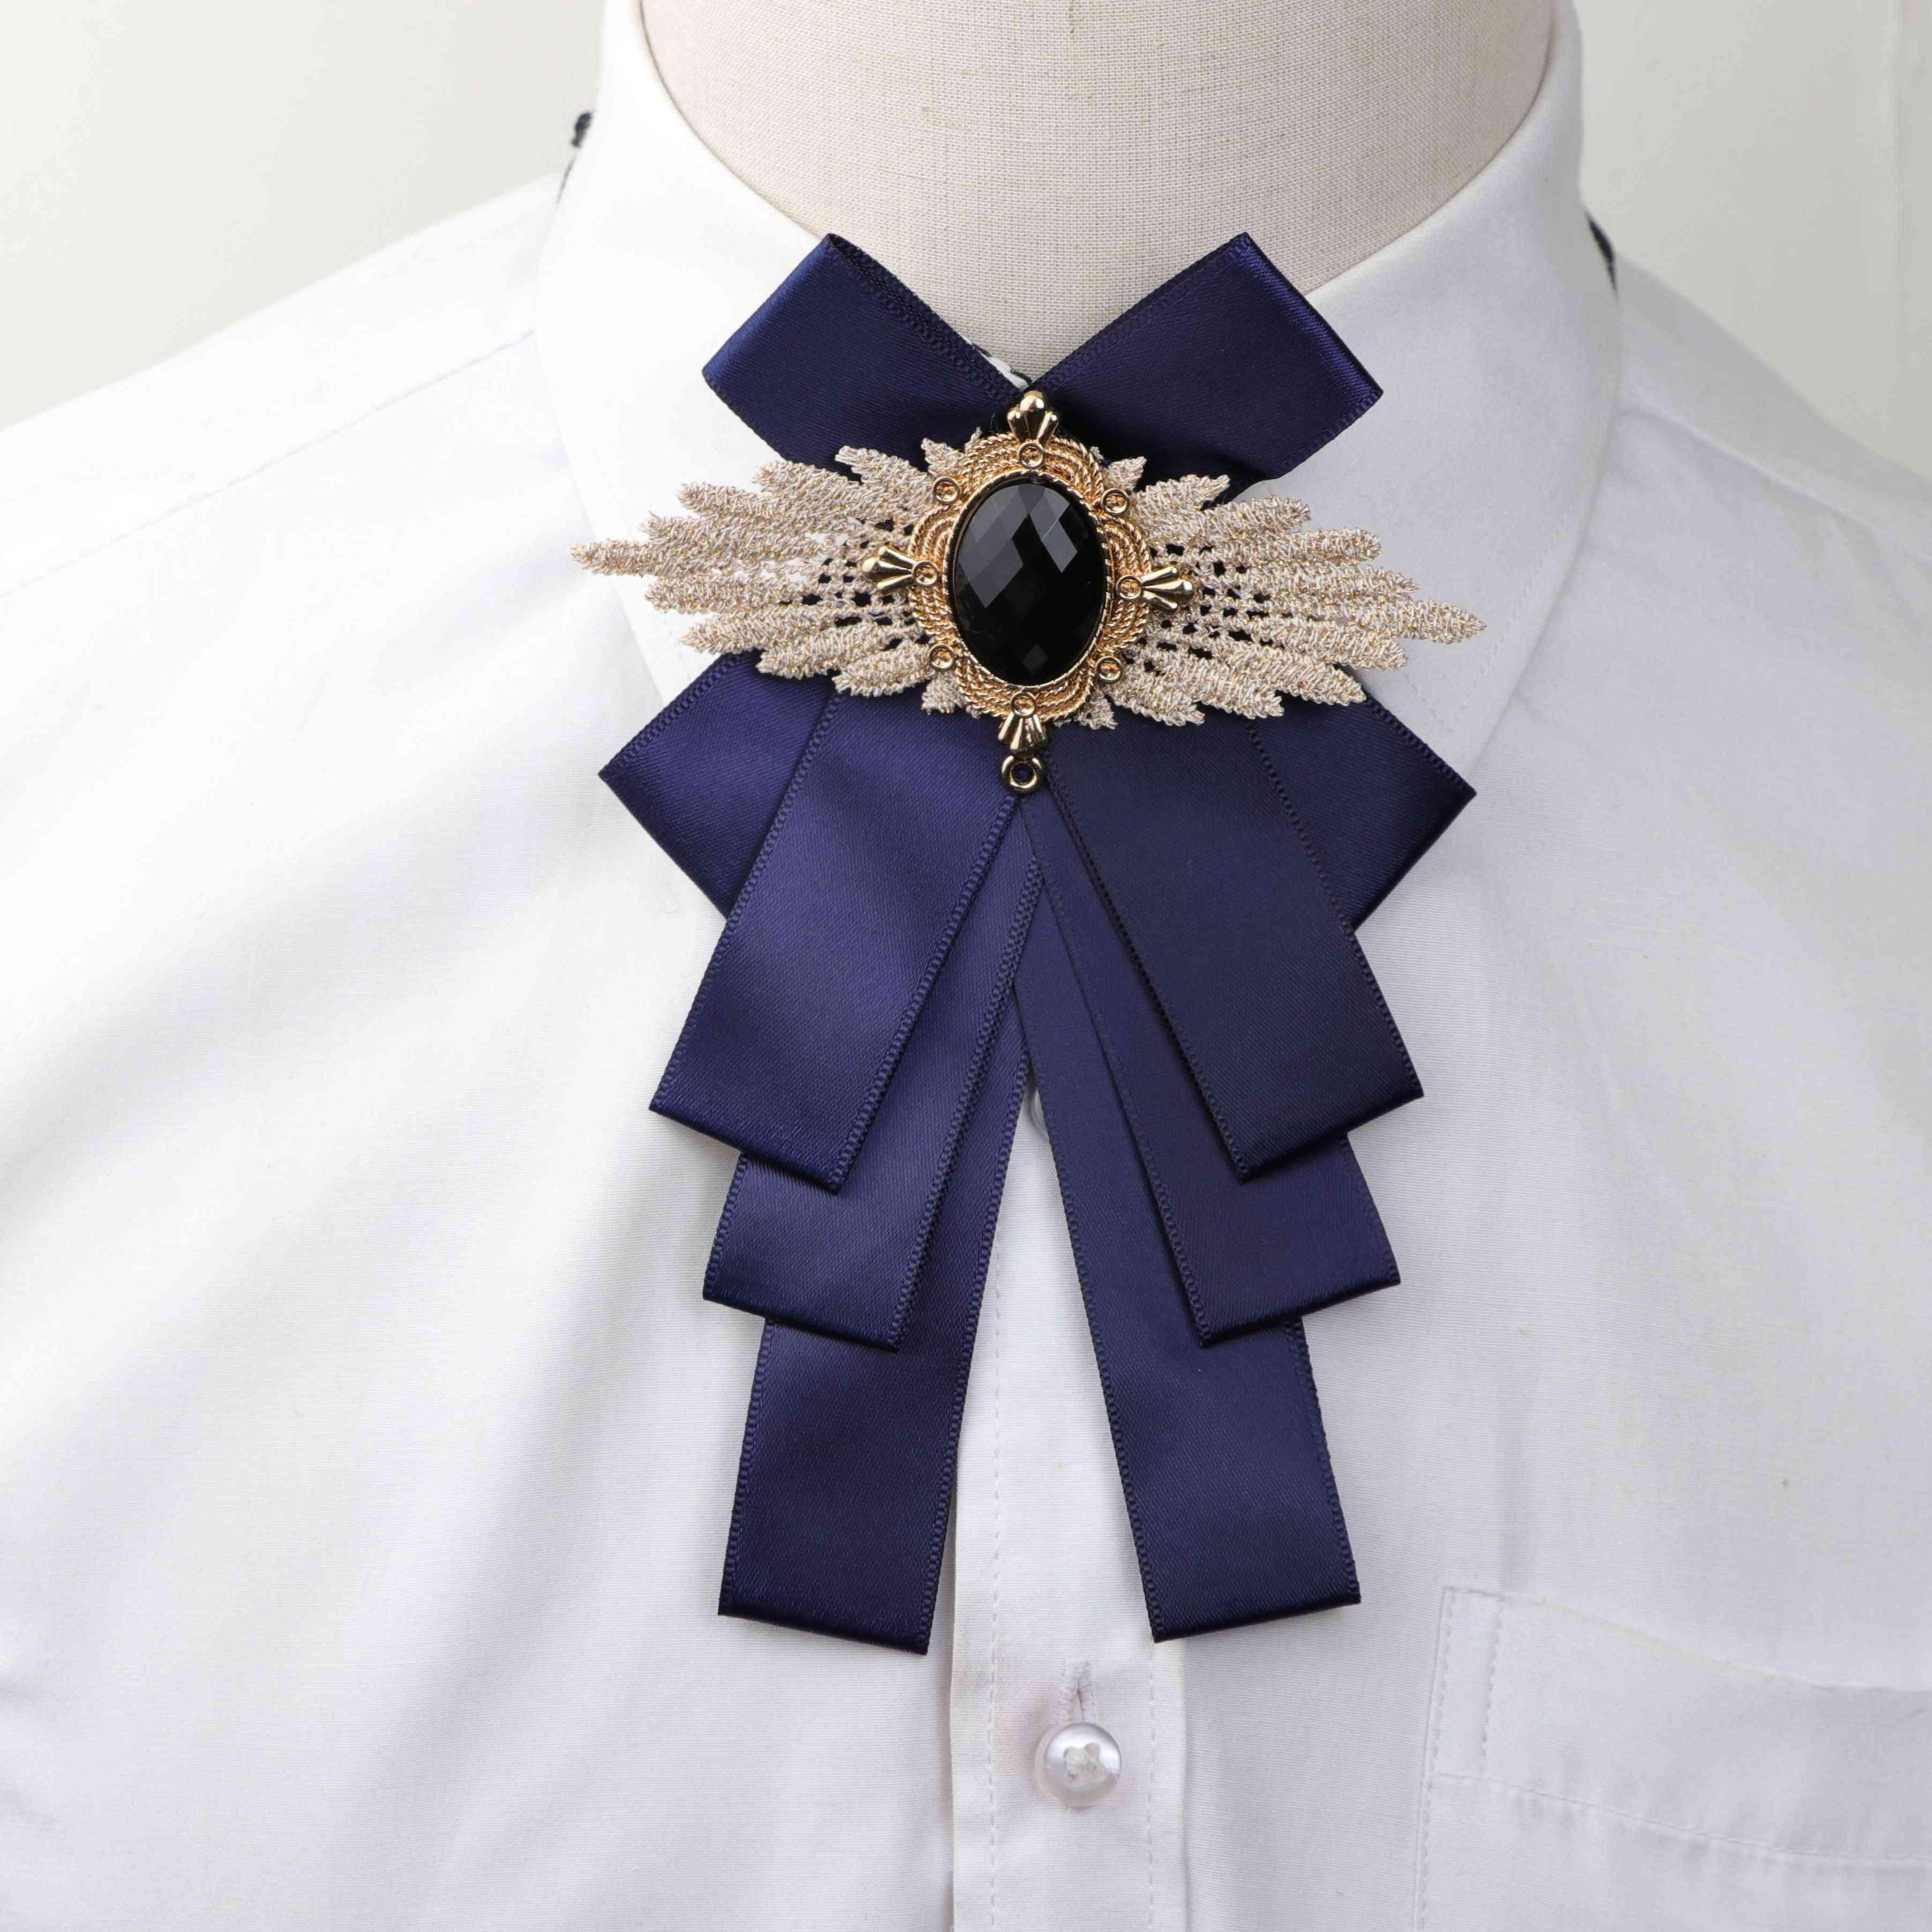 Women Fashion Pretty Ribbon Butterfly Bow Tie, Bowknot